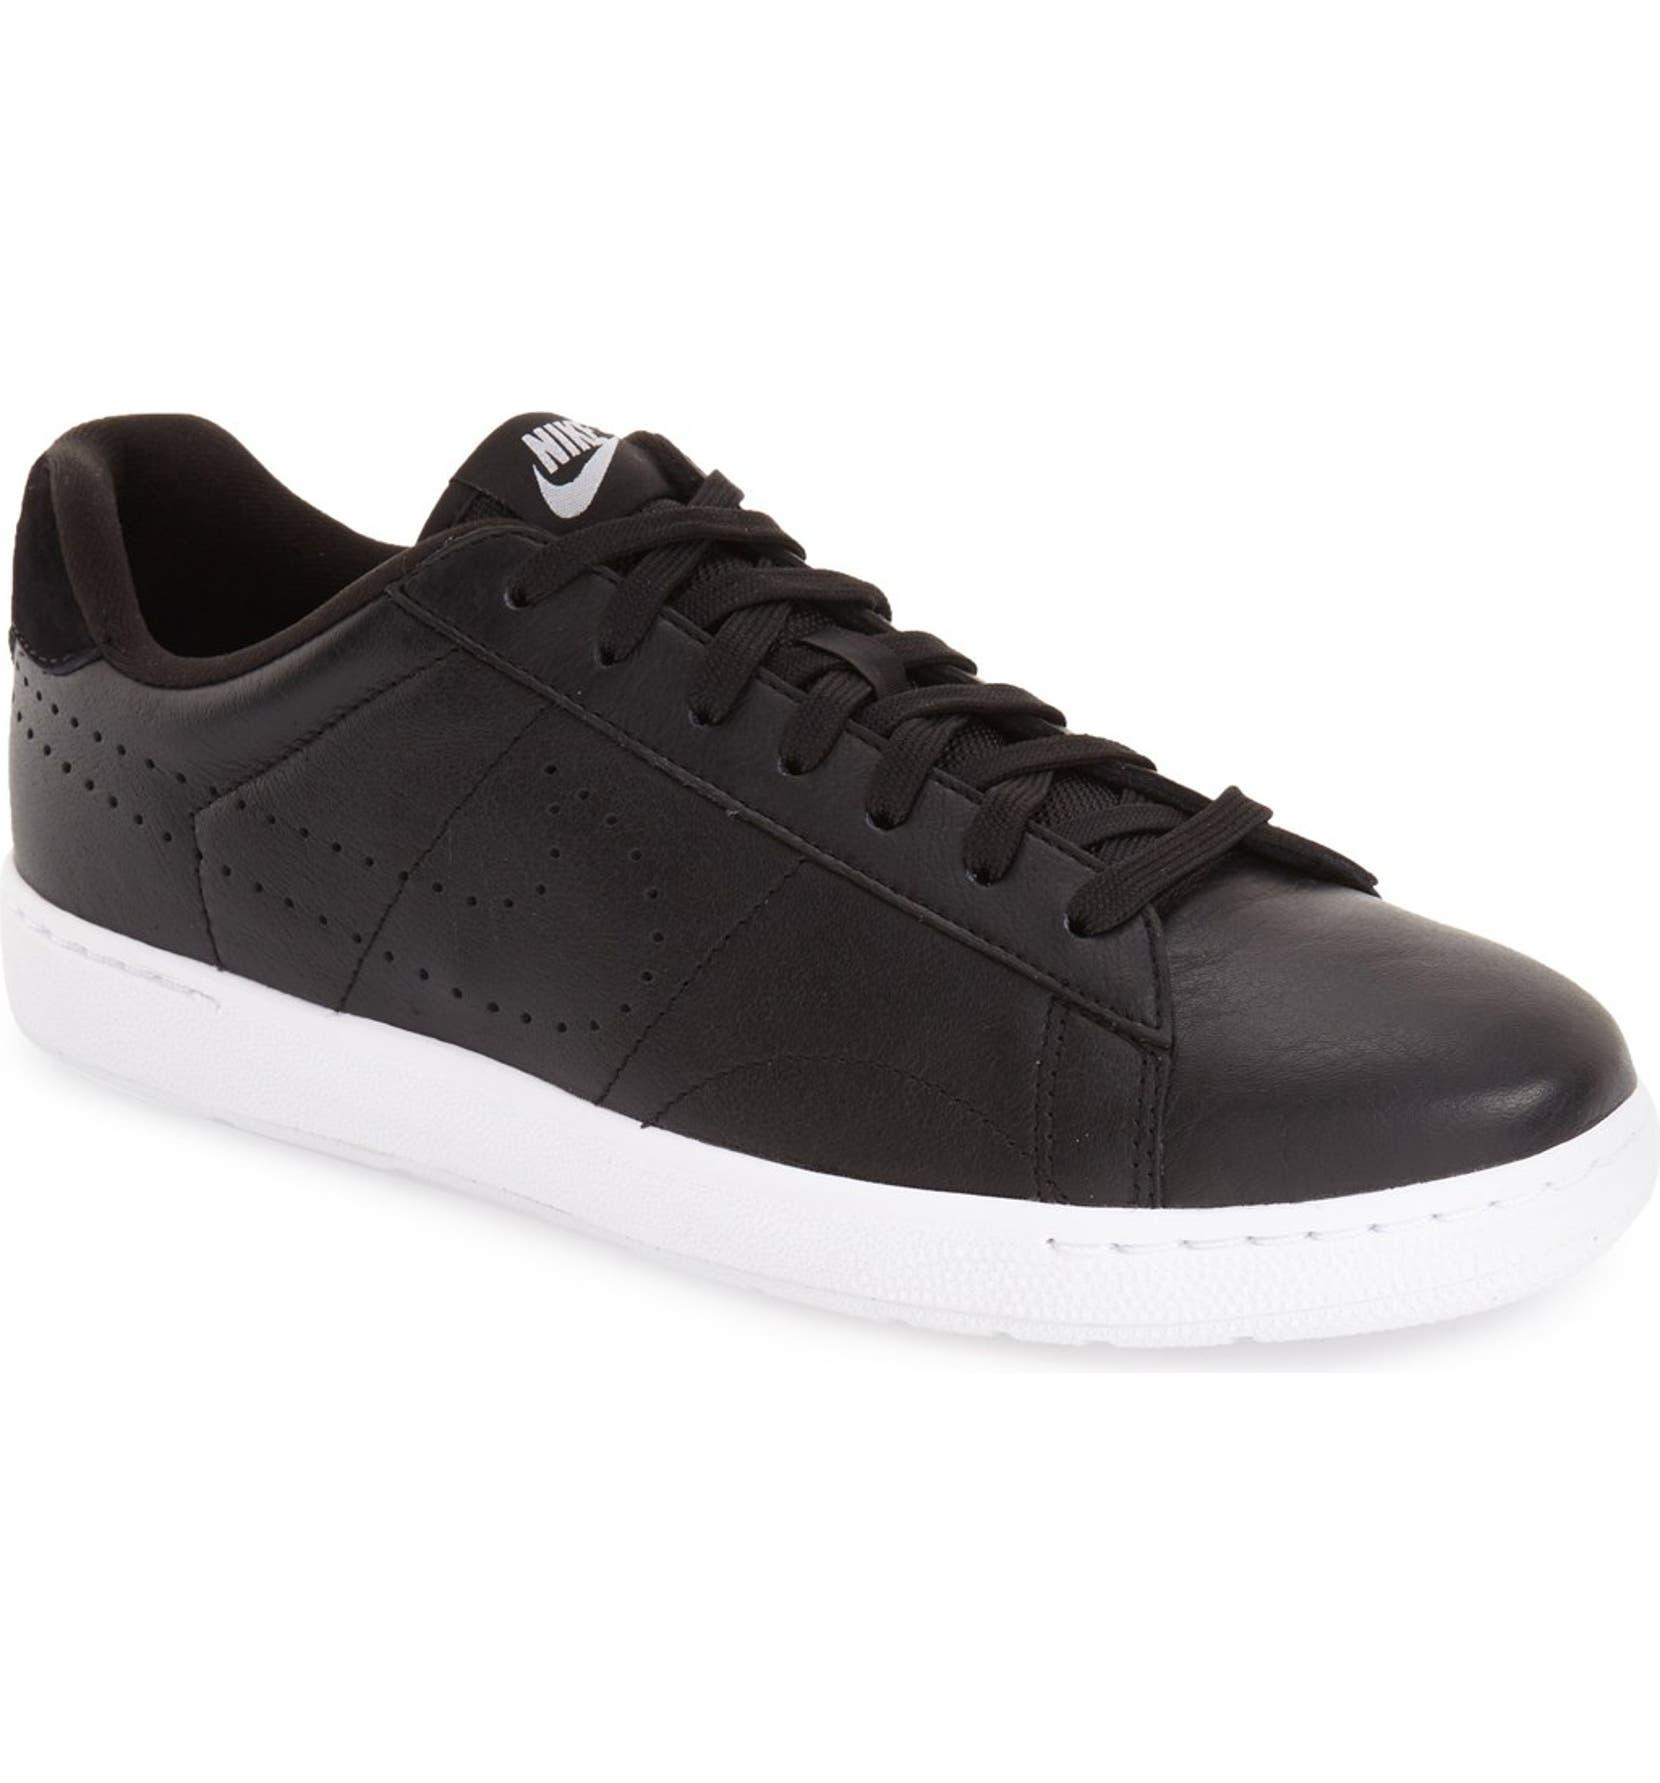 huge discount aea04 b0dd1 Nike Tennis Classic Ultra Sneaker (Men)  Nordstrom